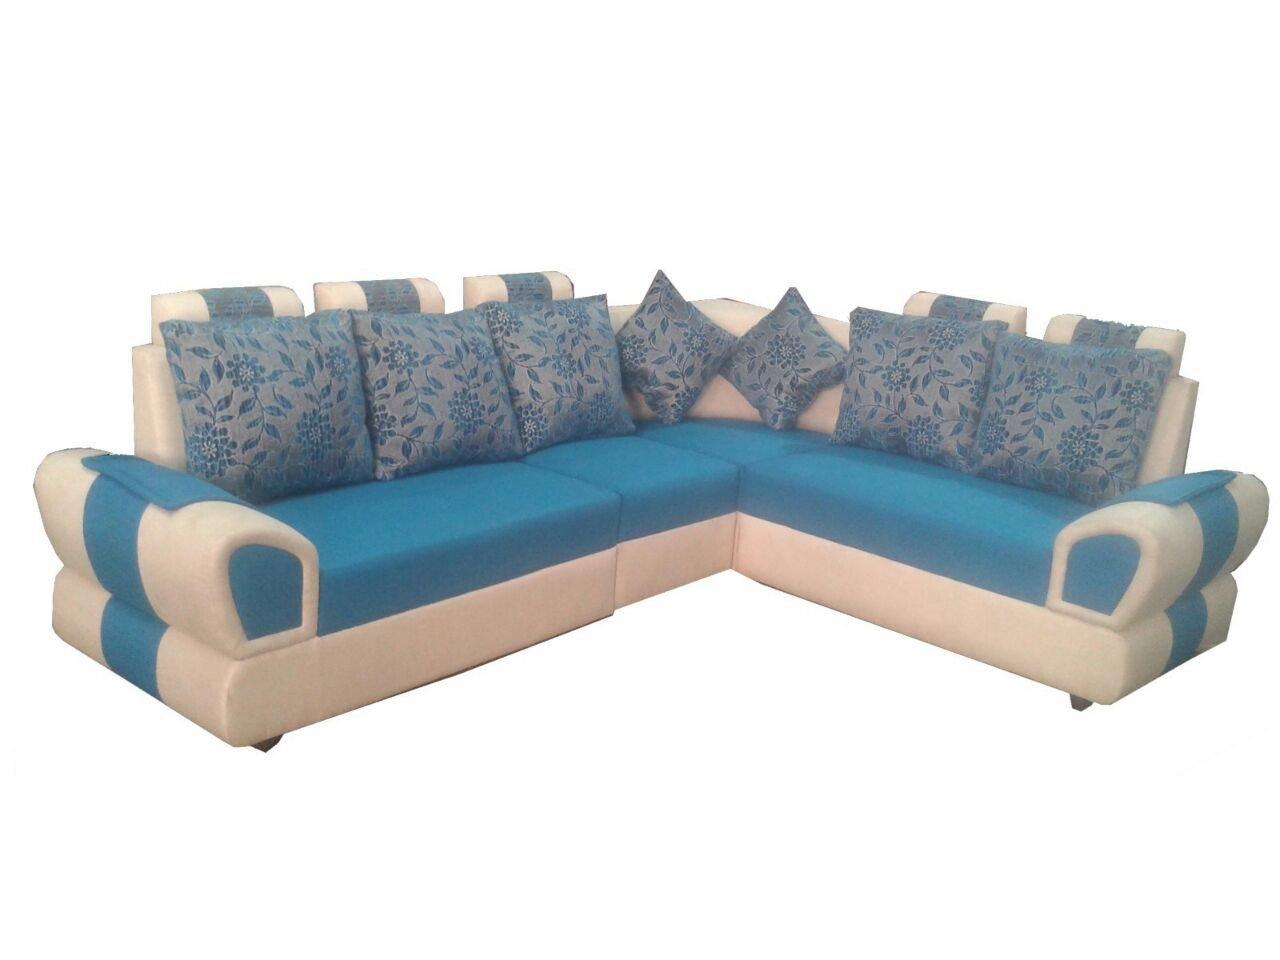 HI-Tech Class Model Five Seater L-Shaped Sofa Set 2+1+2 &1 Corner Seat:  Amazon.in: Home & Kitchen